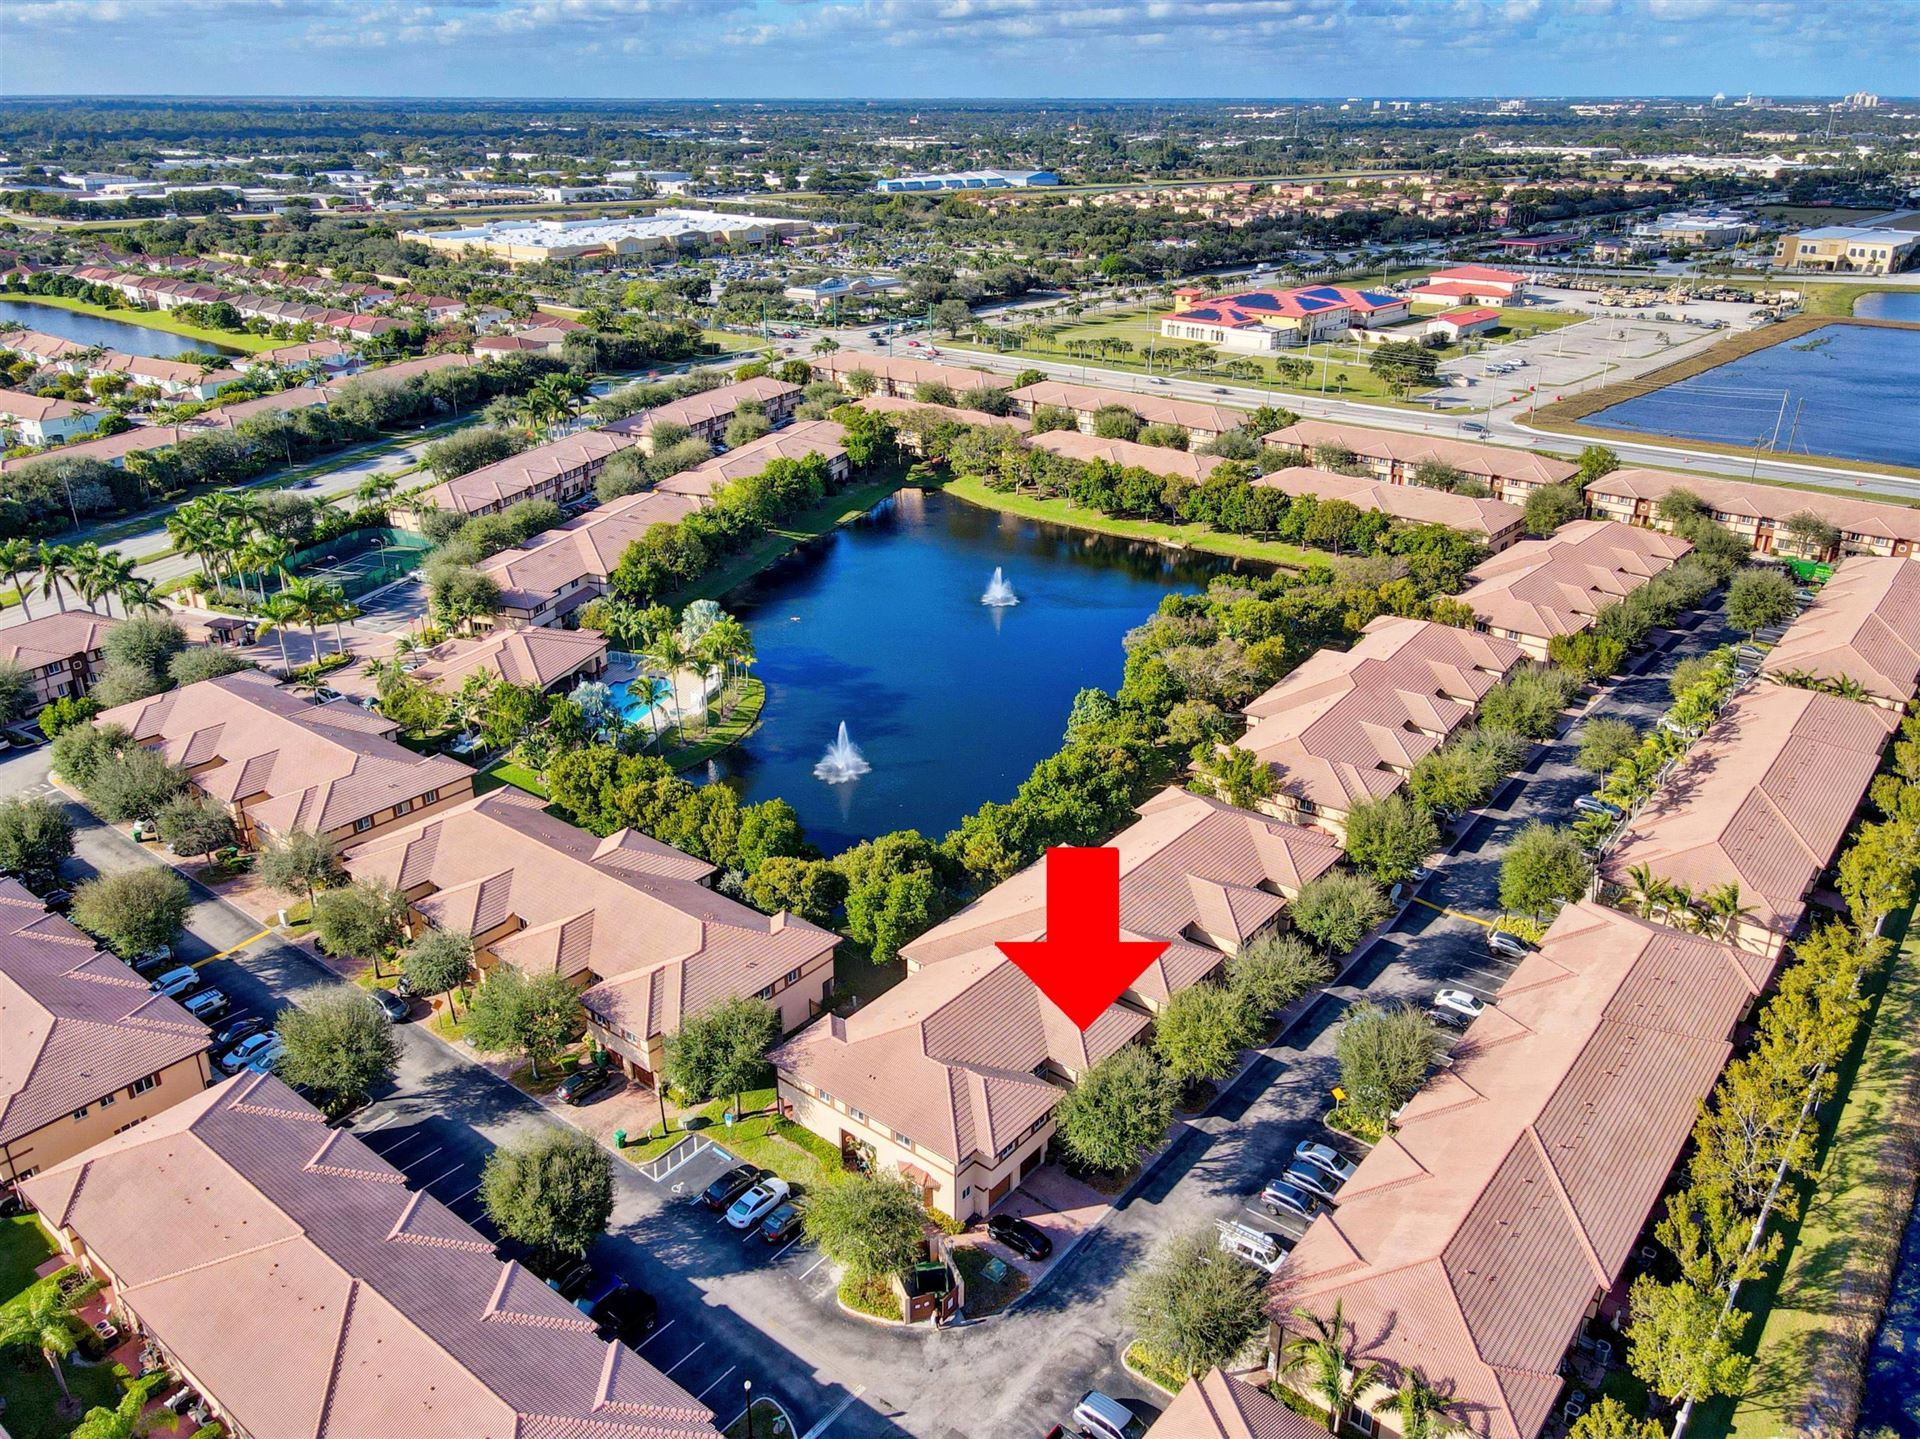 3545 Oleander Terrace, Riviera Beach, FL 33404 - #: RX-10680459